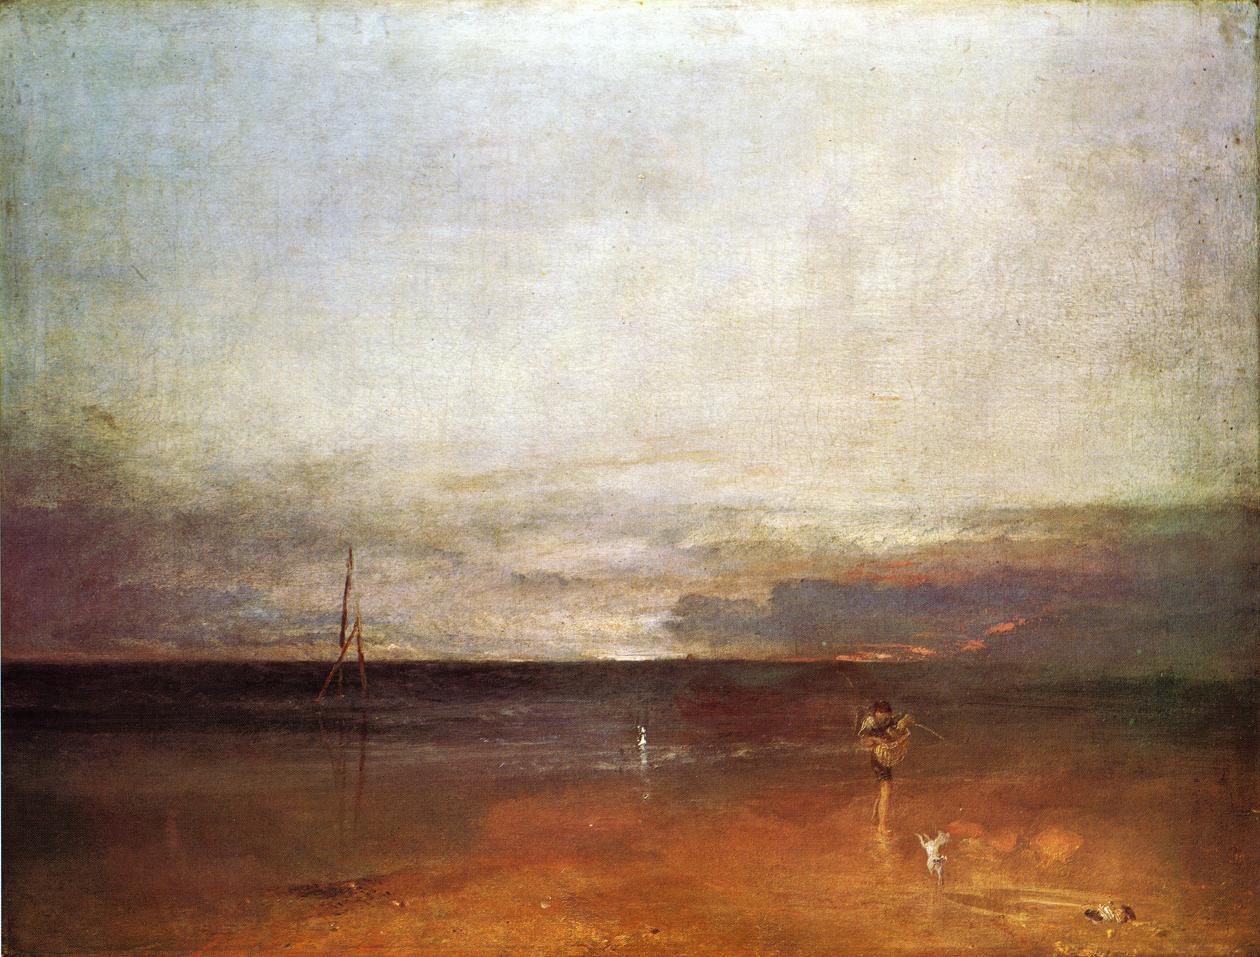 картина < Скалистая бухта с фигурами >:: Уильям Тёрнер ( William Turner ) - Тёрнер Уйльям фото